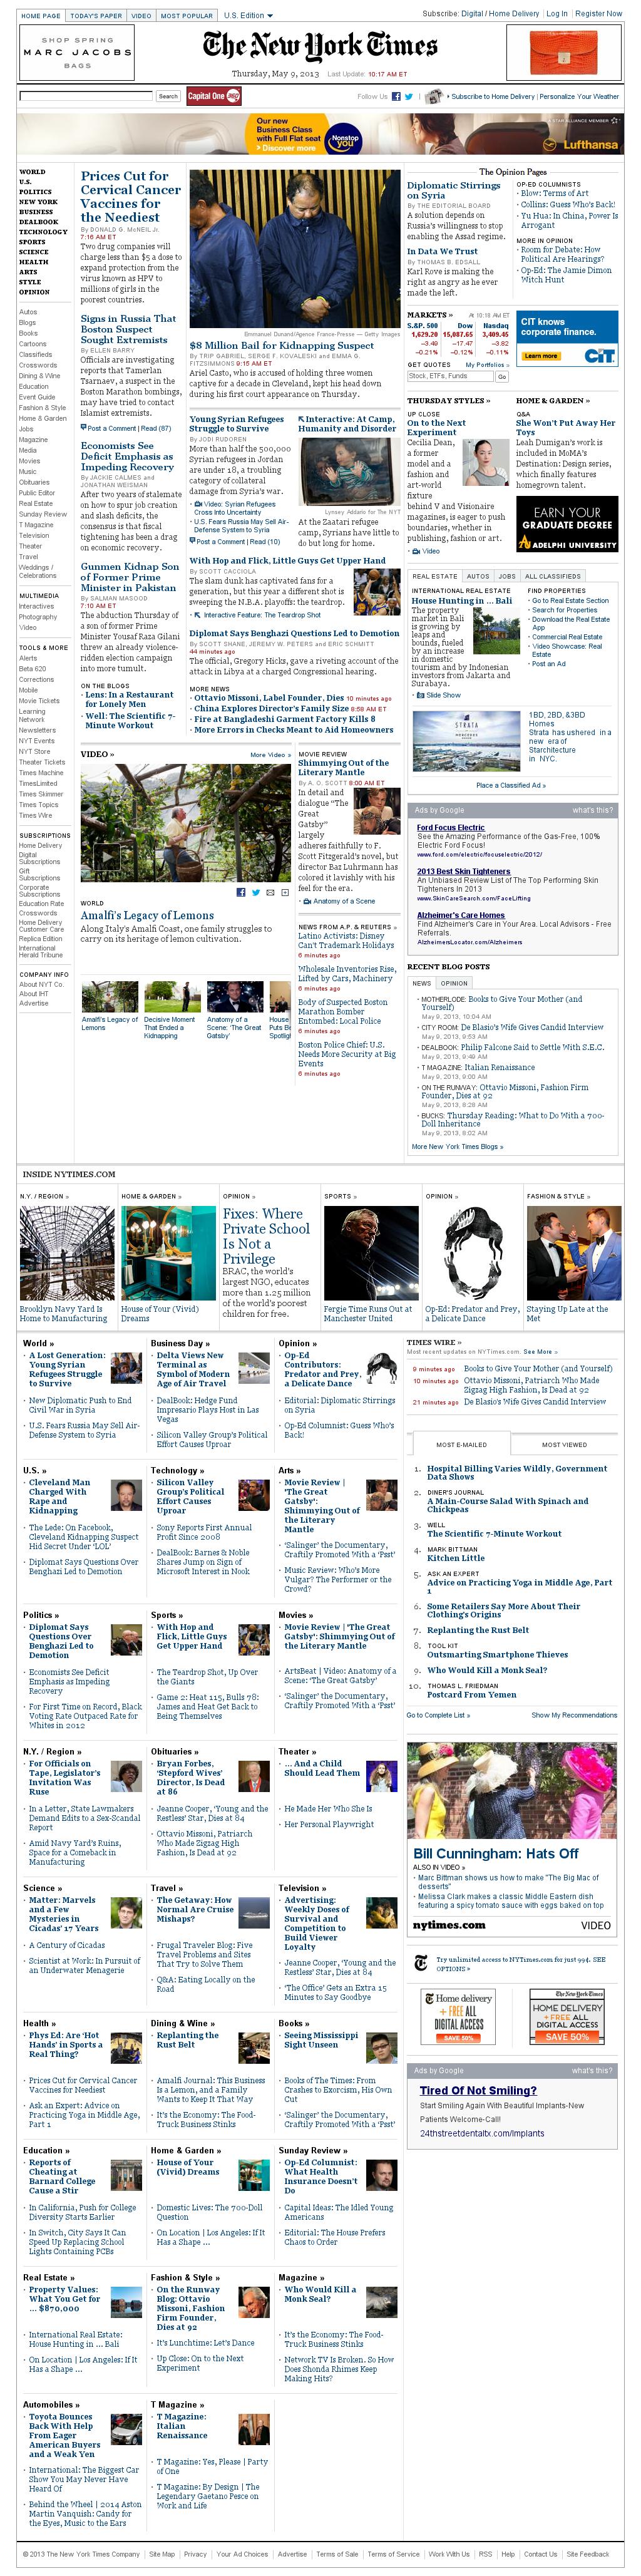 The New York Times at Thursday May 9, 2013, 2:19 p.m. UTC